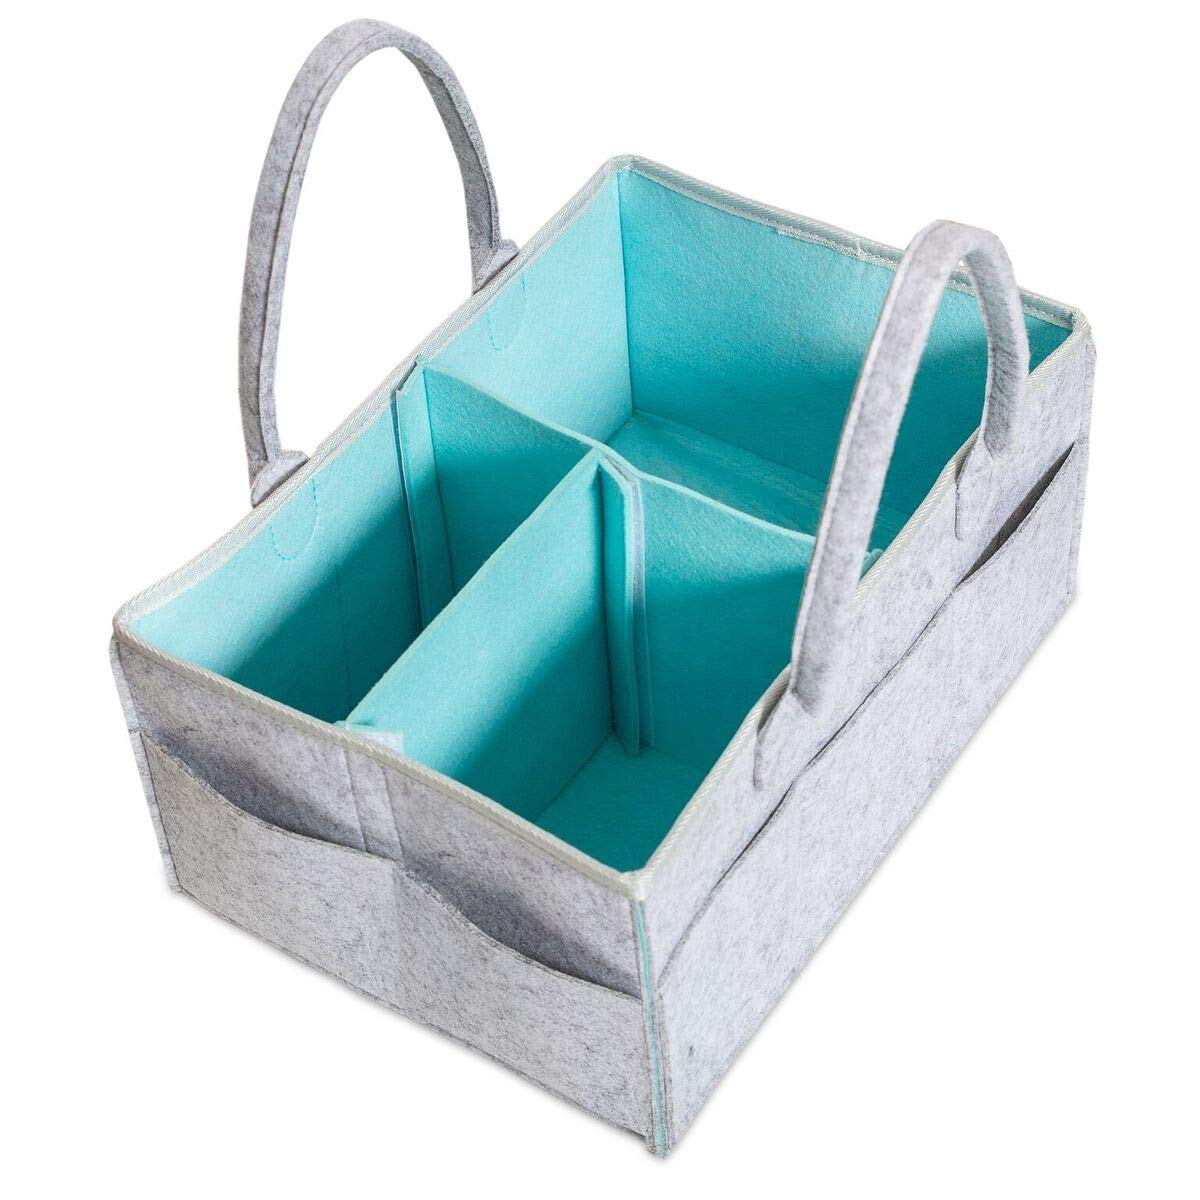 Baby Diaper Caddy Organizer   Baby Shower Gift Basket for Boys Girls   Felt Tote Bag   Nursery Storage Bin for Changing Tables   New Born Registry Must Haves   Portable Car Travel Organizer (Grey)